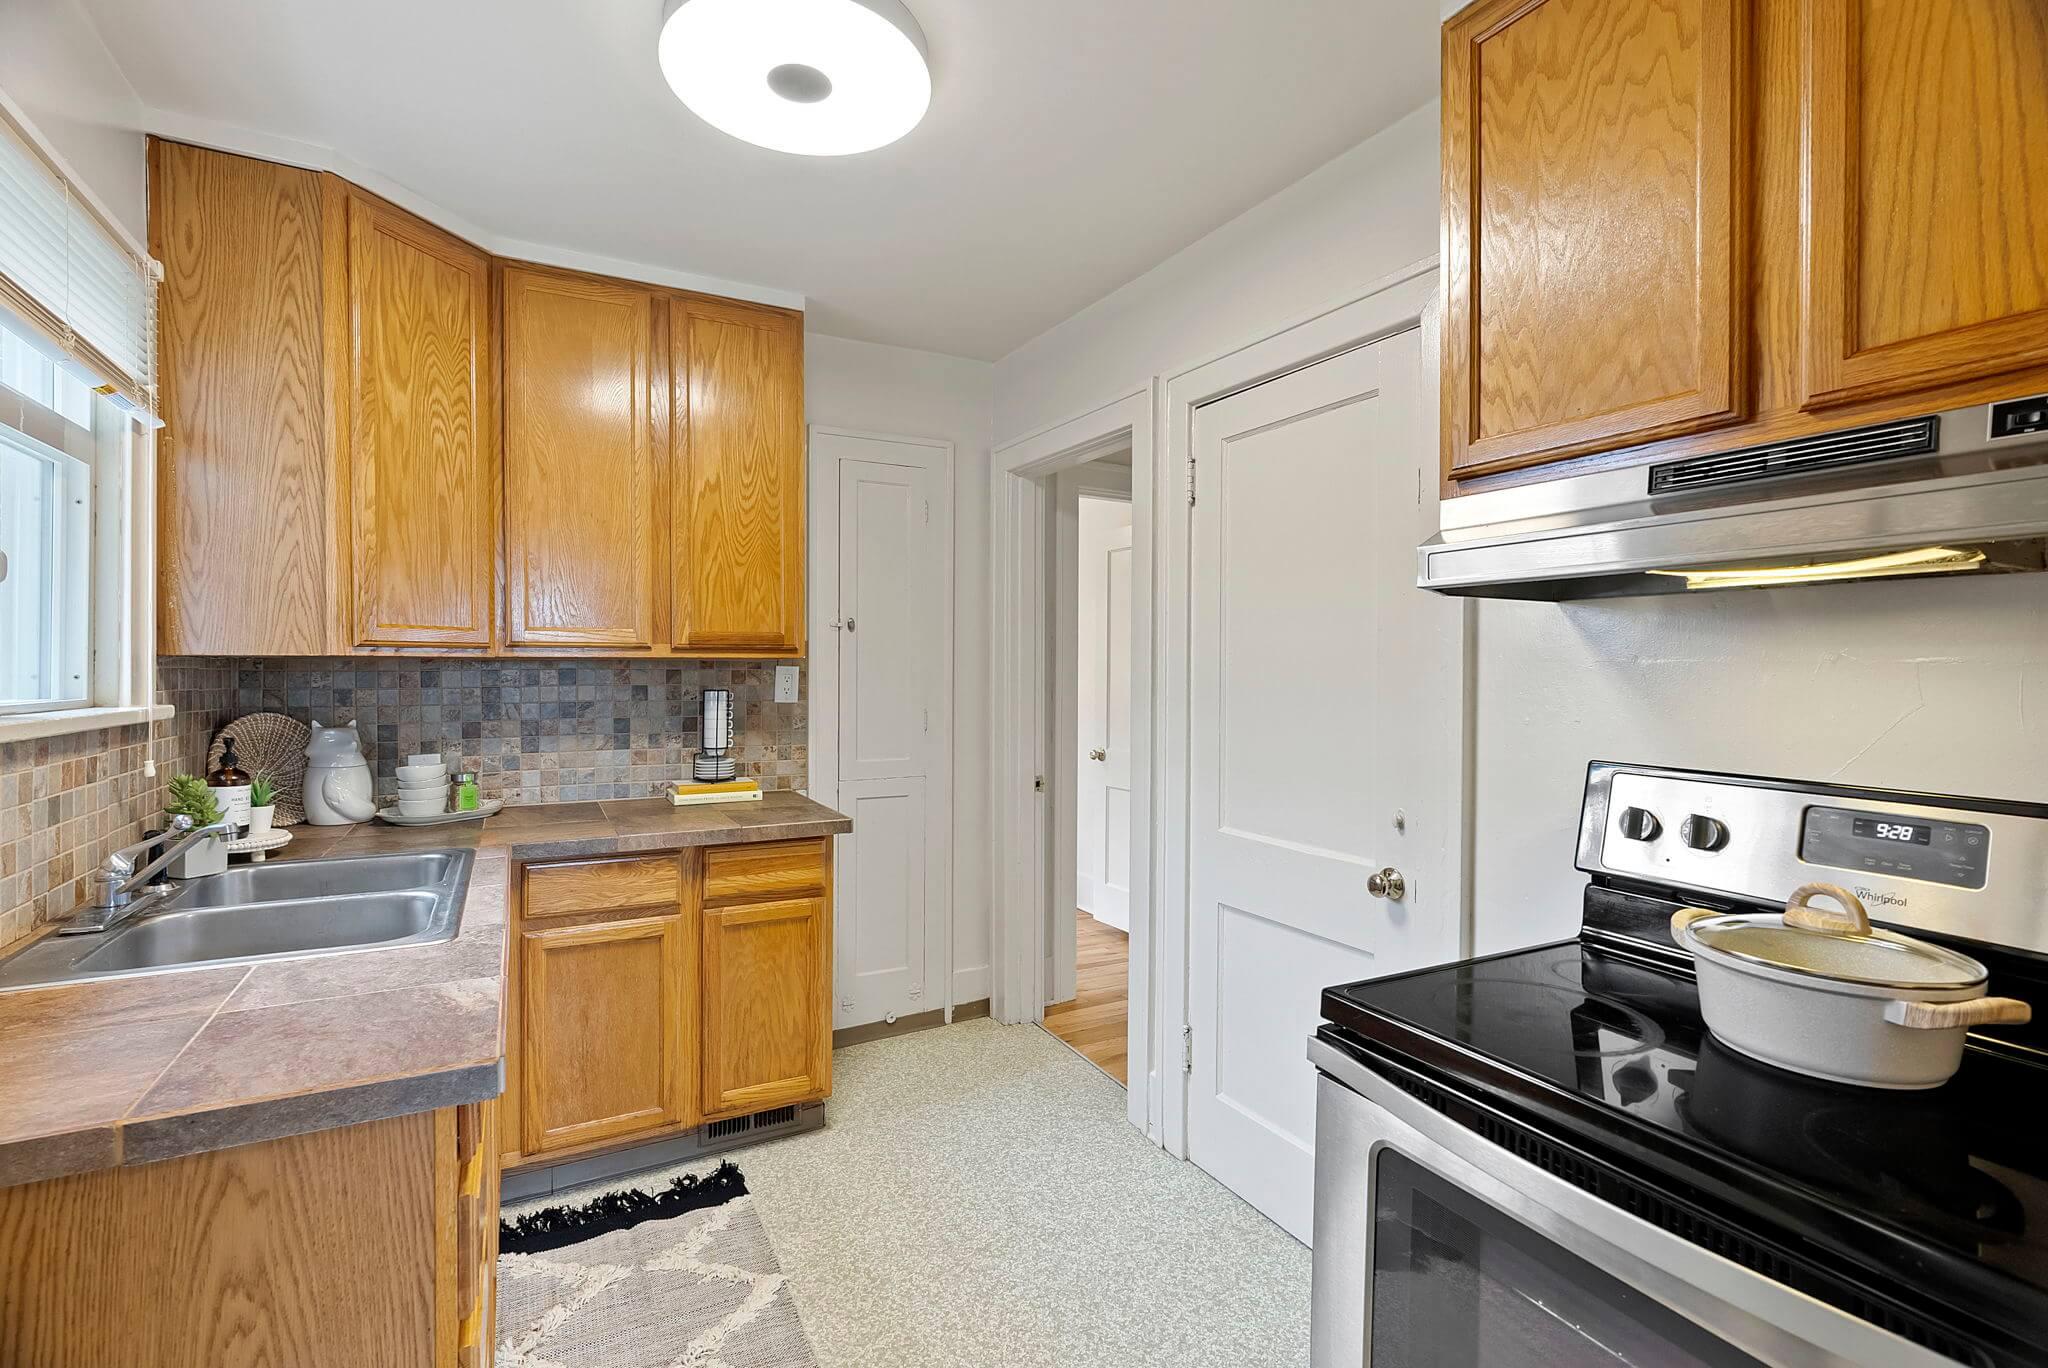 Closed kitchen door leads to basement